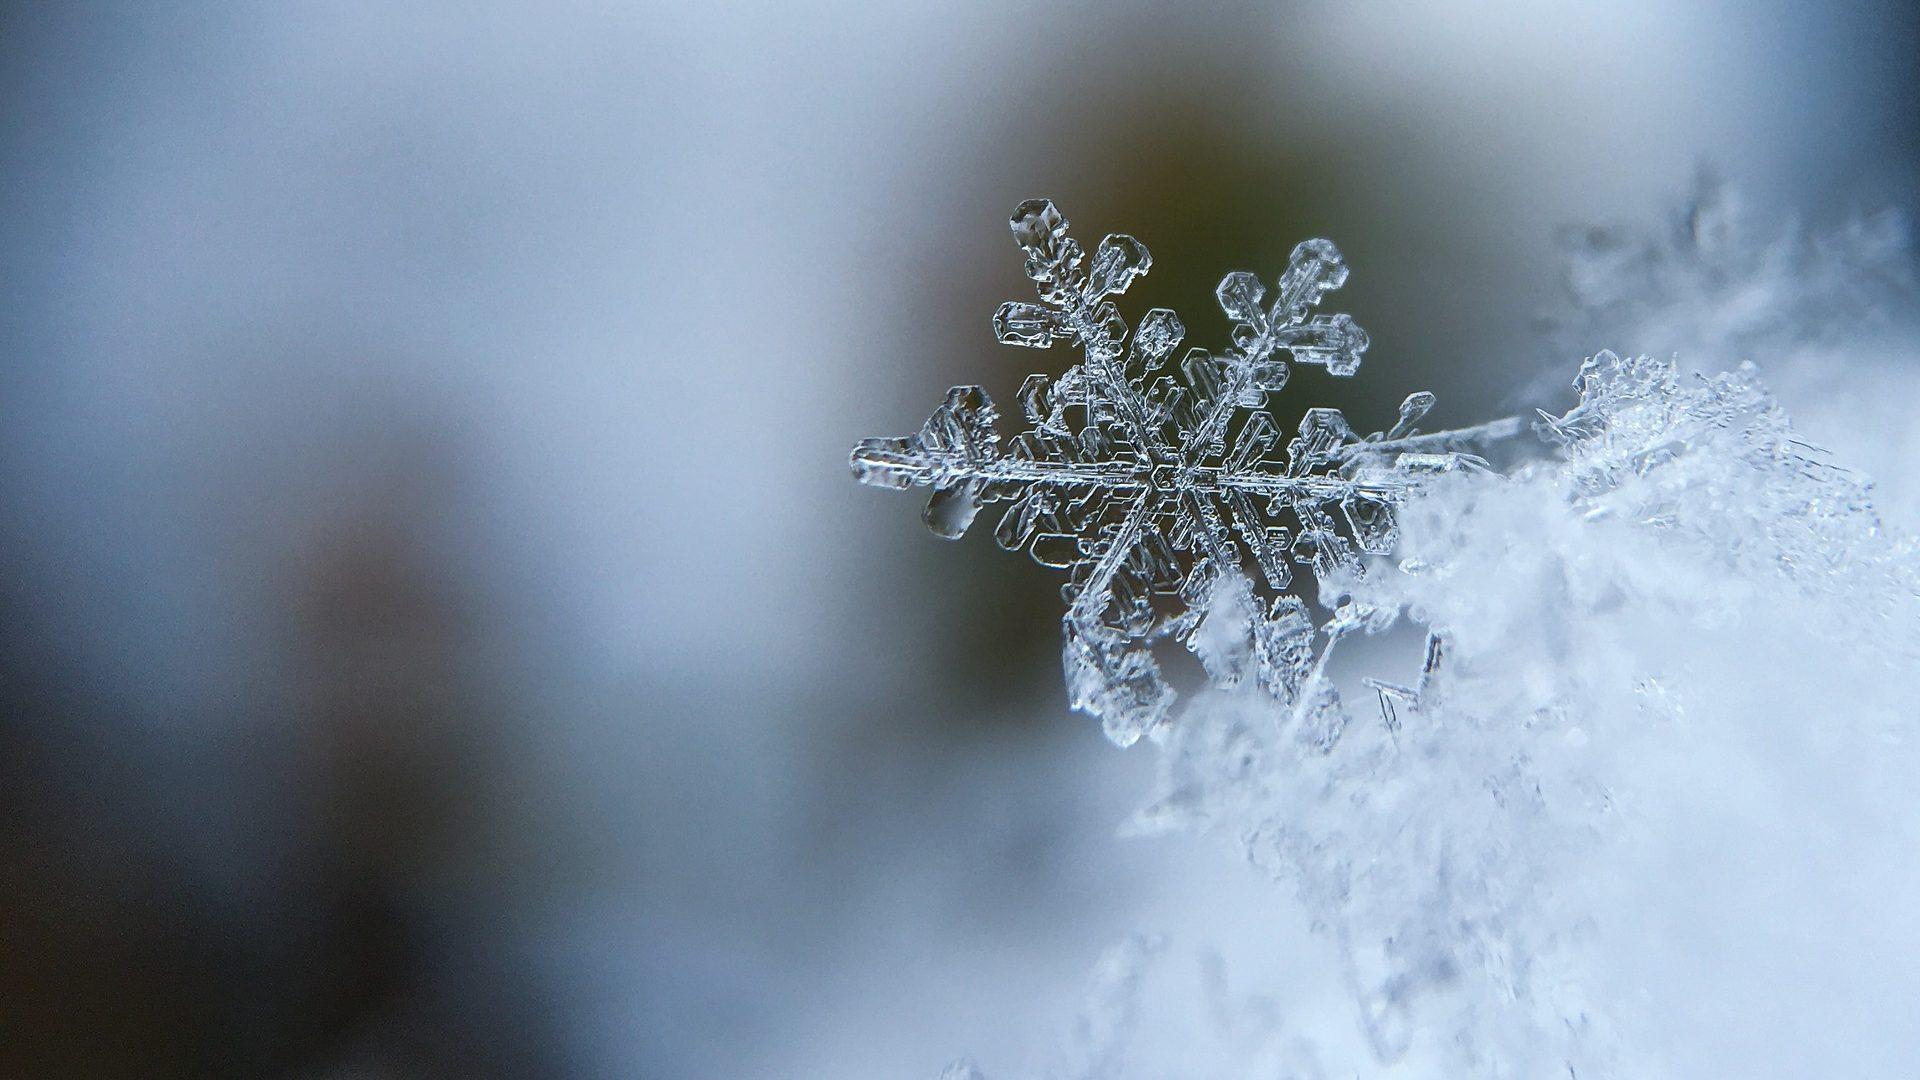 snowflake-1245748_1920-1920x1080.jpg